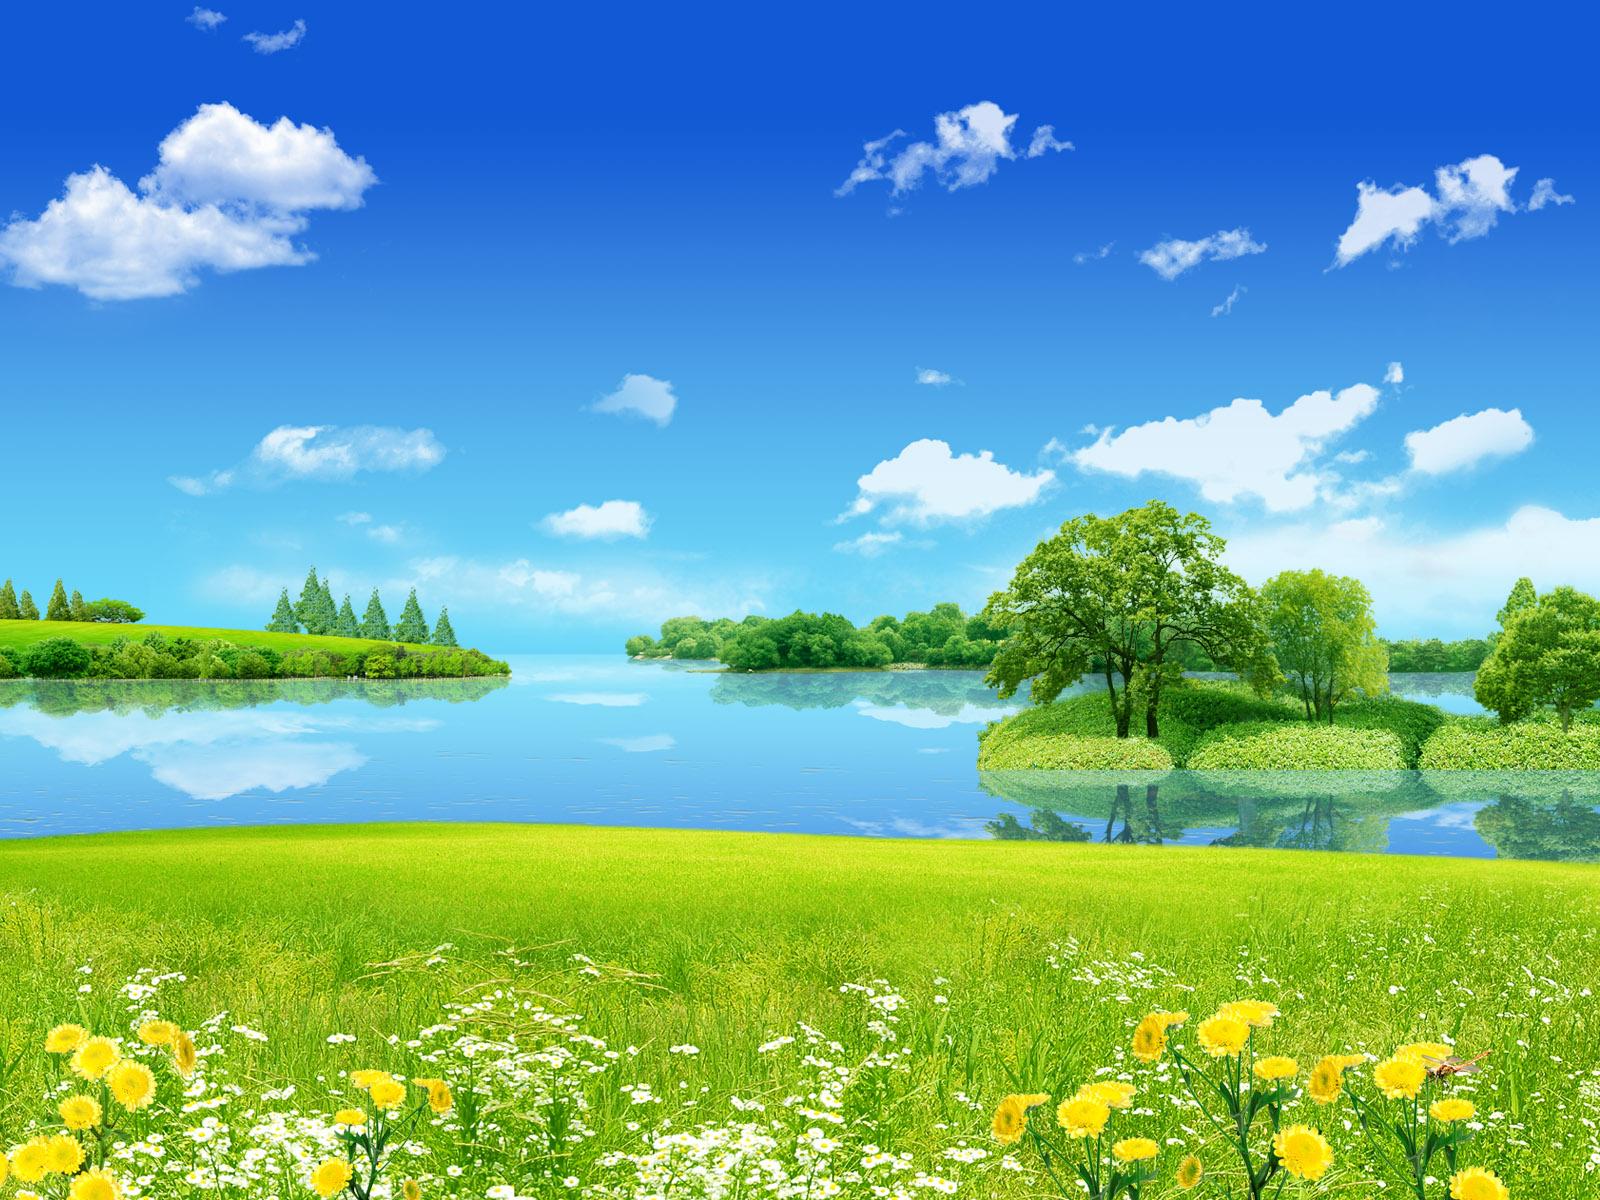 http://1.bp.blogspot.com/-iC4yW5AvHv8/T2tLcxpuM1I/AAAAAAAAGW8/qfM9mJl4xkk/s1600/Photoshop-Wallpapers-22.jpg